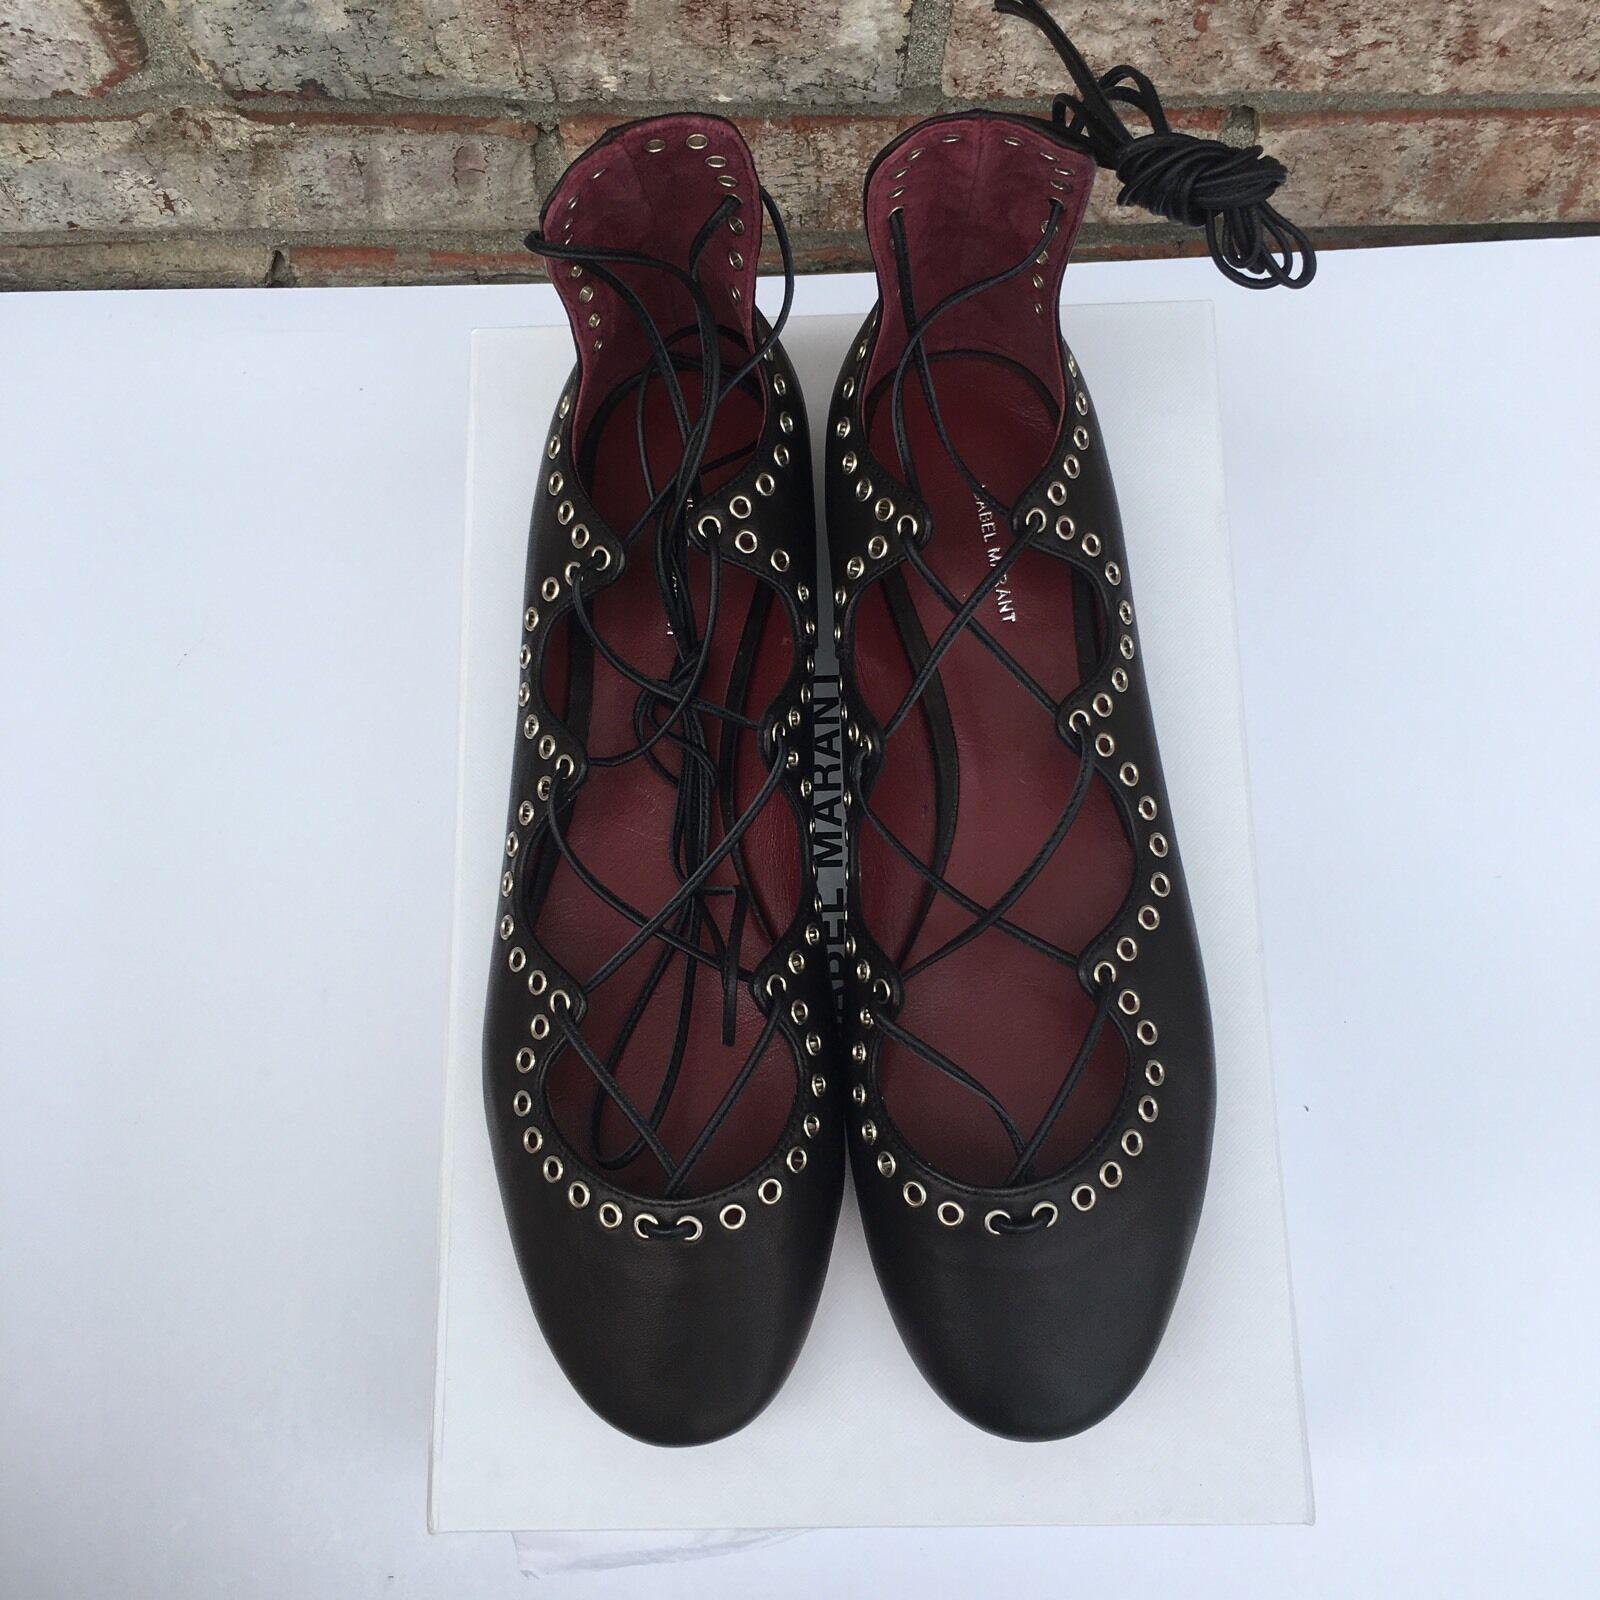 outlet online Isabel Marant Leo Lace Up Tie Ballerinas Ballerinas Ballerinas Ballet Leather Flats nero Dimensione 40  grande sconto